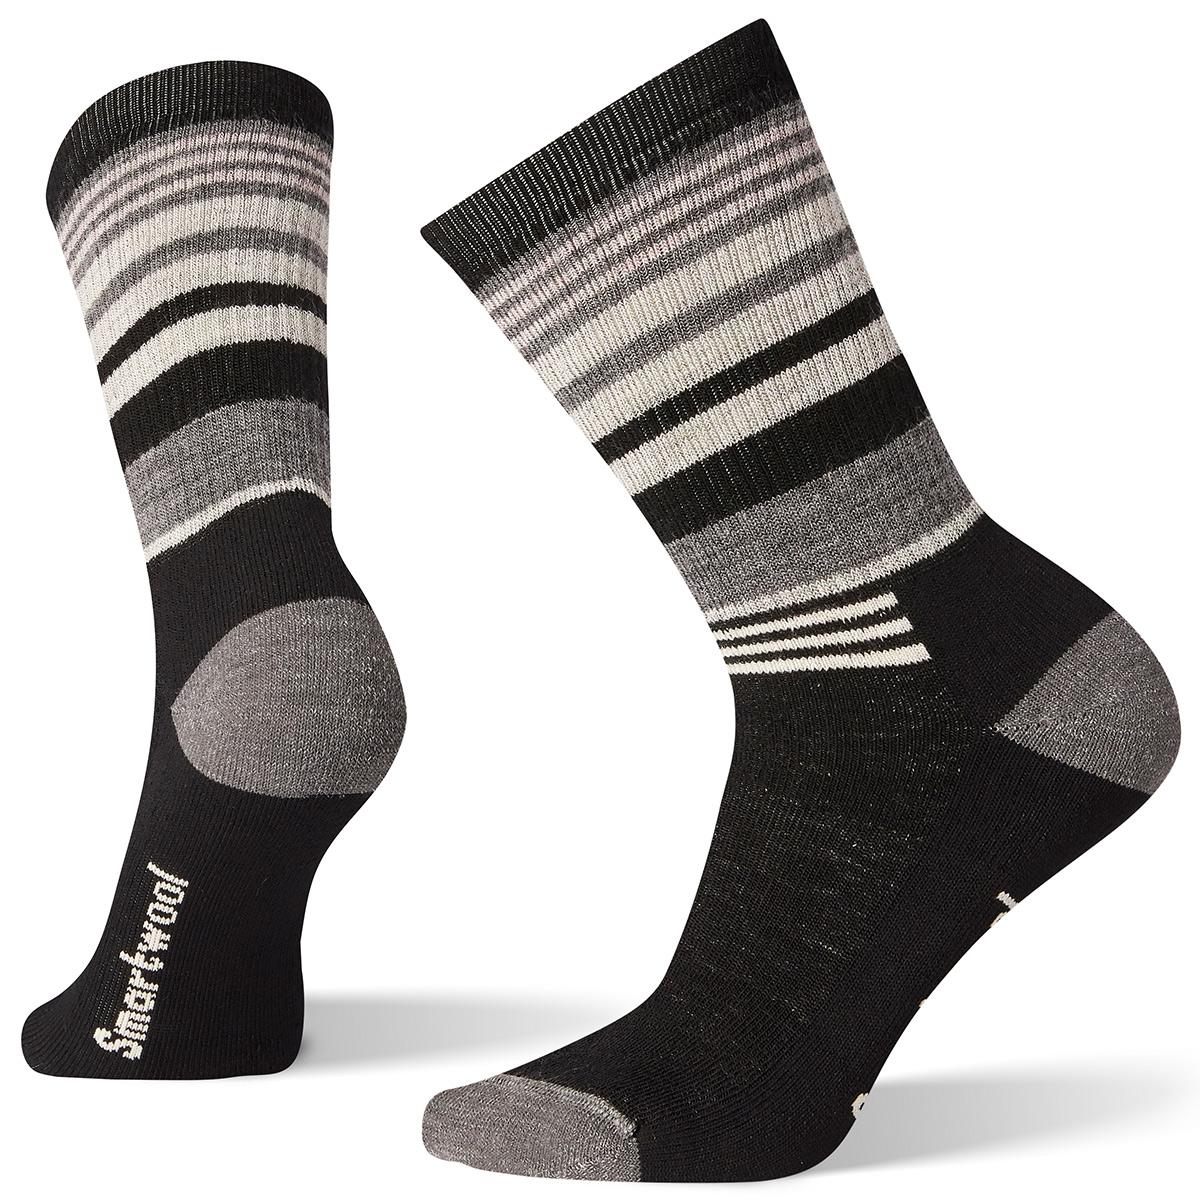 Smartwool Women's Hike Crew Socks - Black, L